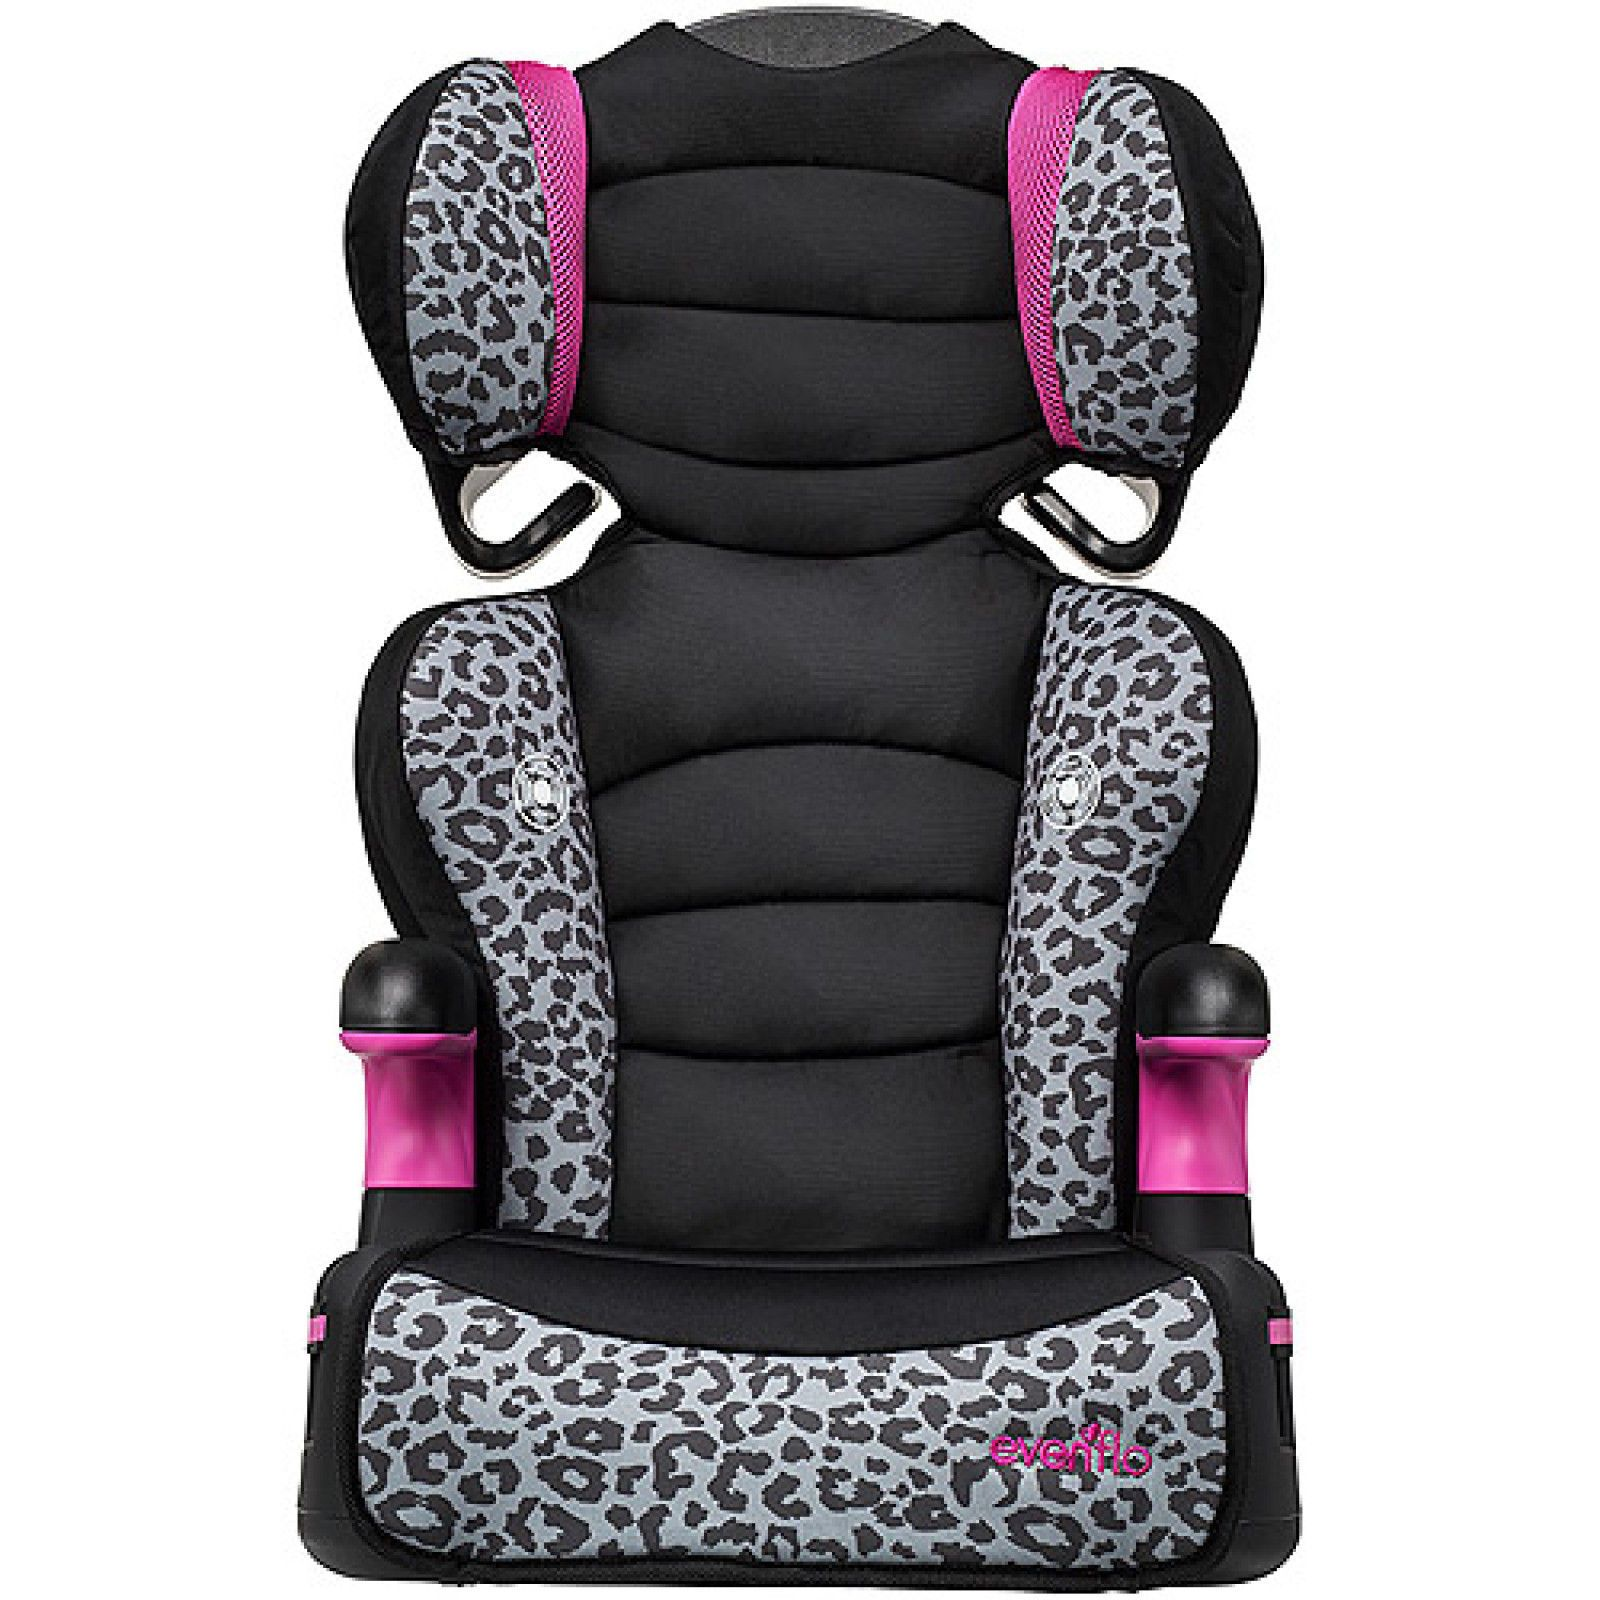 Booster Car Seat Toddler Children Baby Infant Safety Kids